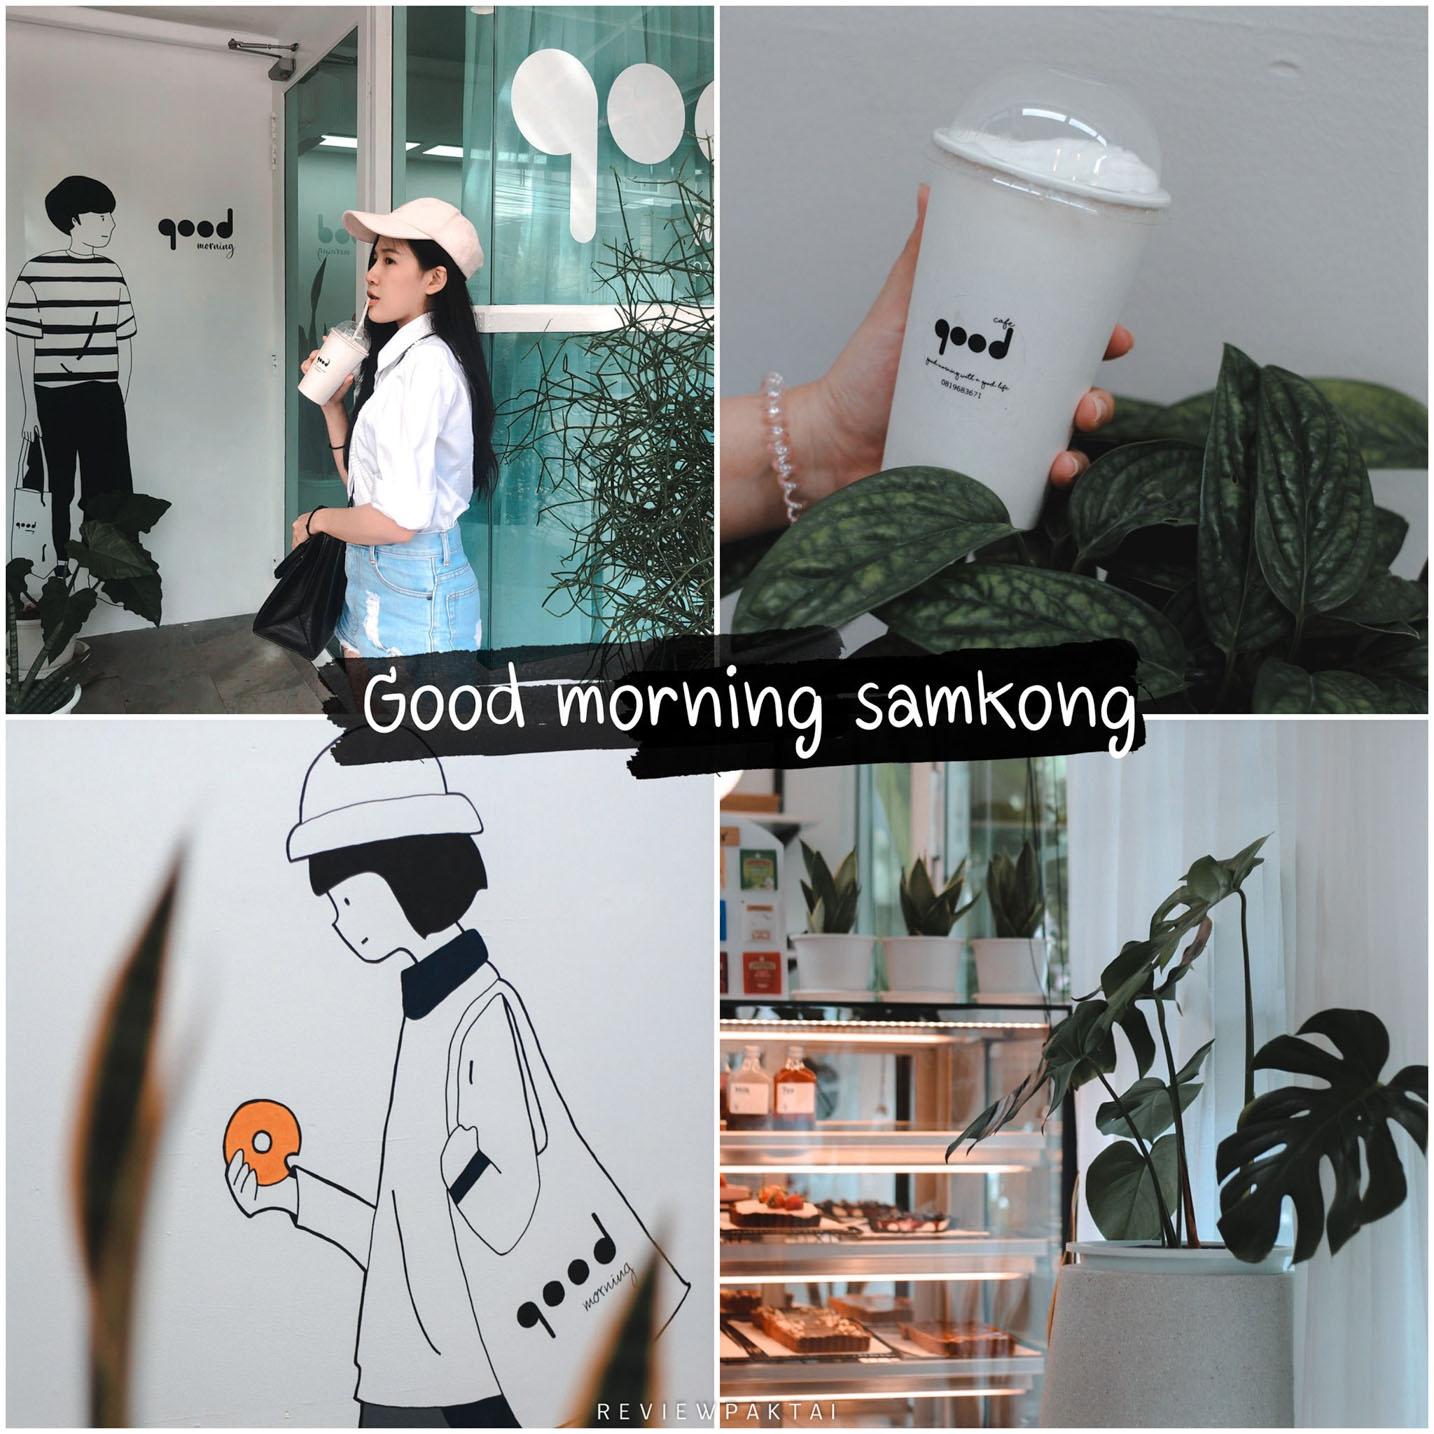 Good Morning by Good Cafe ร้านดีๆพลาดไม่ได้แล้วกับบรรยากาศดีๆ โทนสีขาว-ดำสไตล์มินิมอลไม่ผิดหวังแน่นอนน